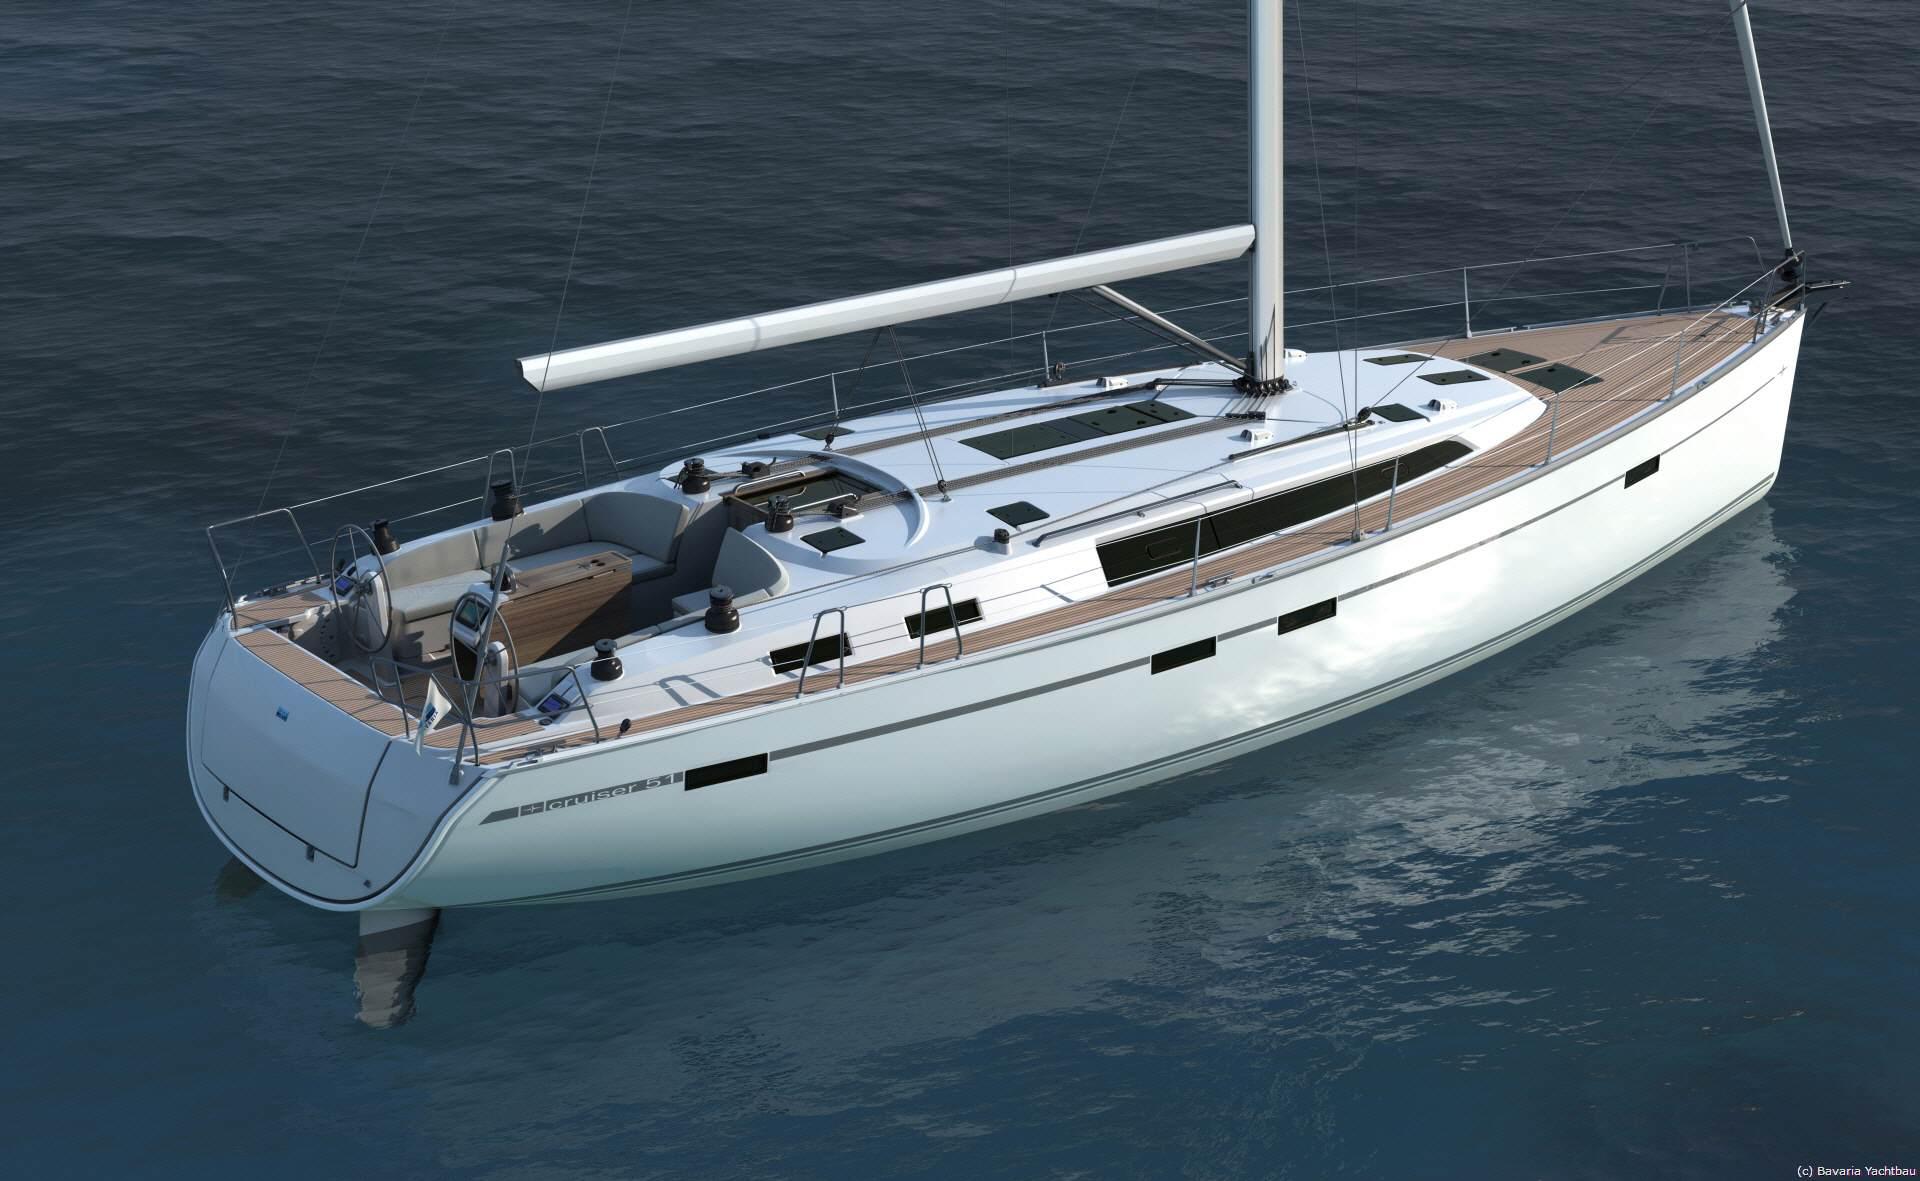 Luxus segelyacht holz  Yachtfernsehen.com Alles über Bavaria Yachtbau / Bavaria Yachts ...